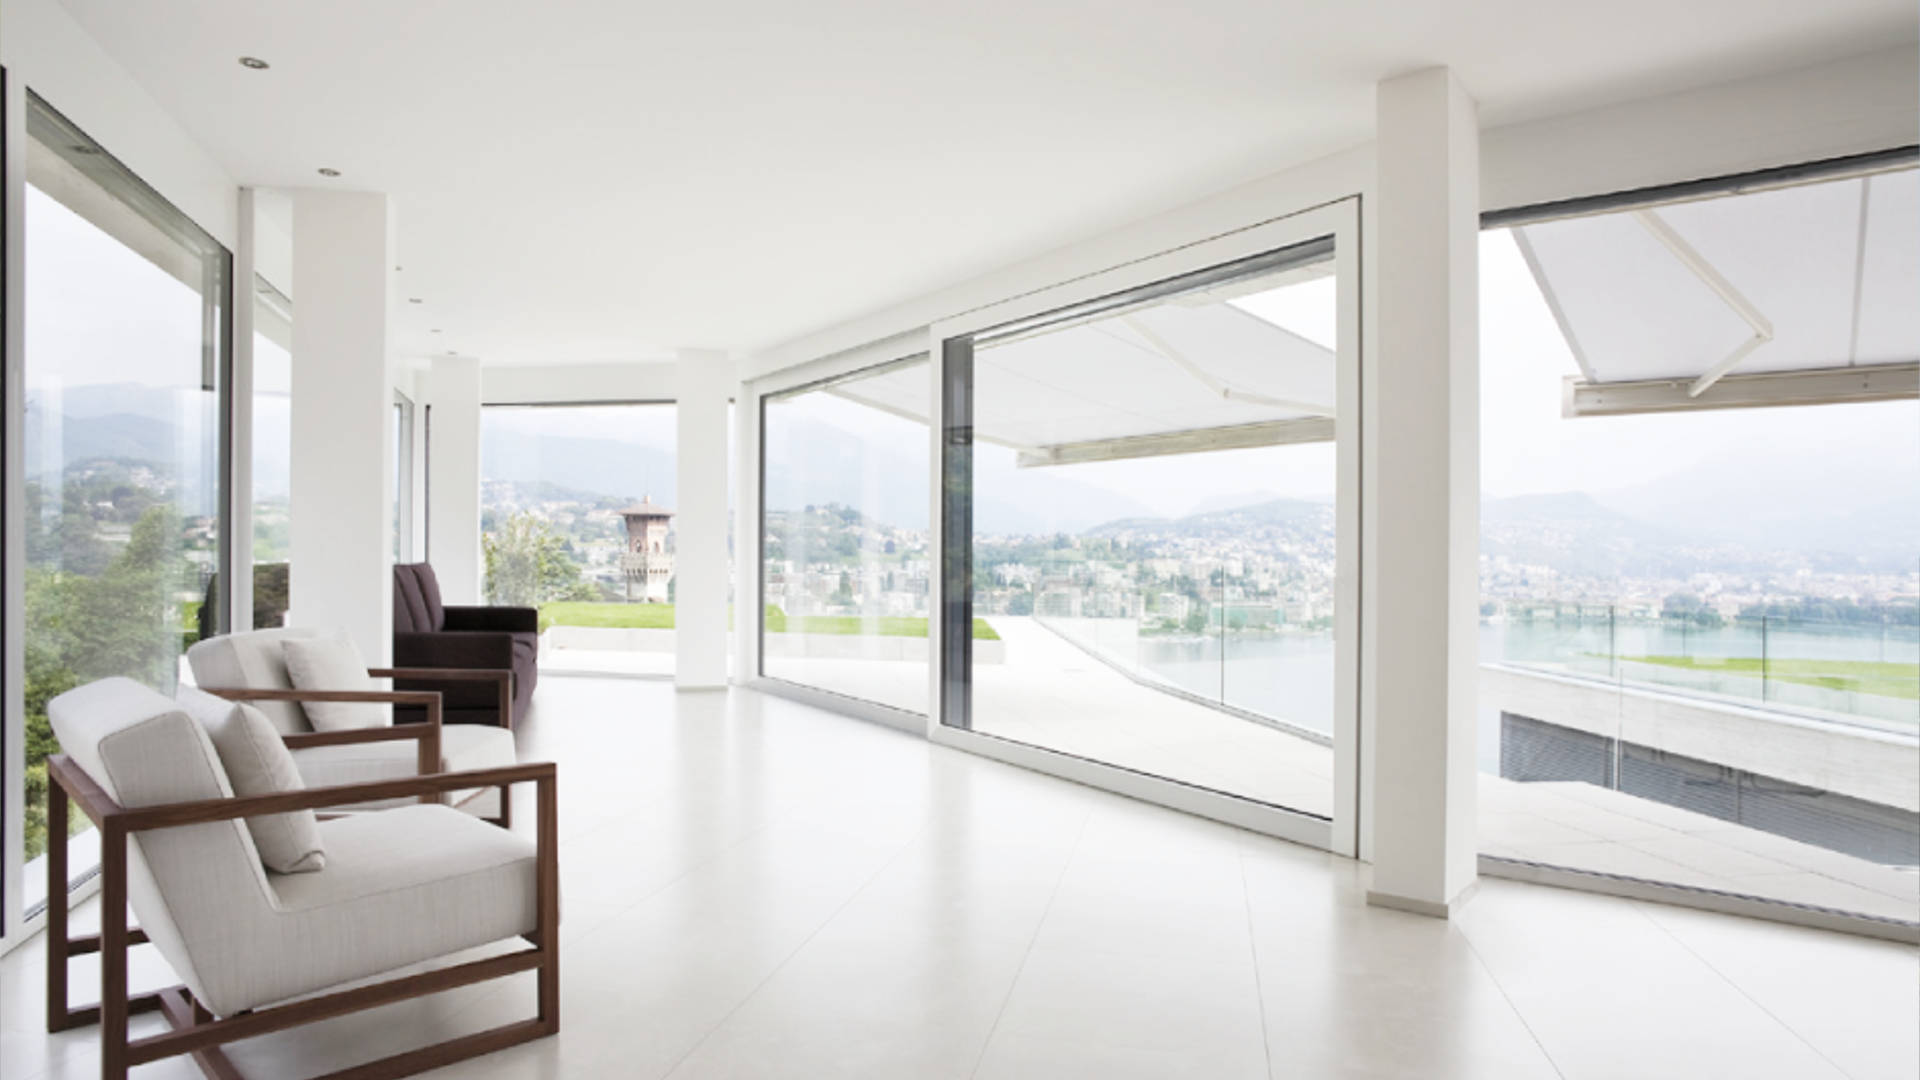 Sistema eku per finestre scorrevoli